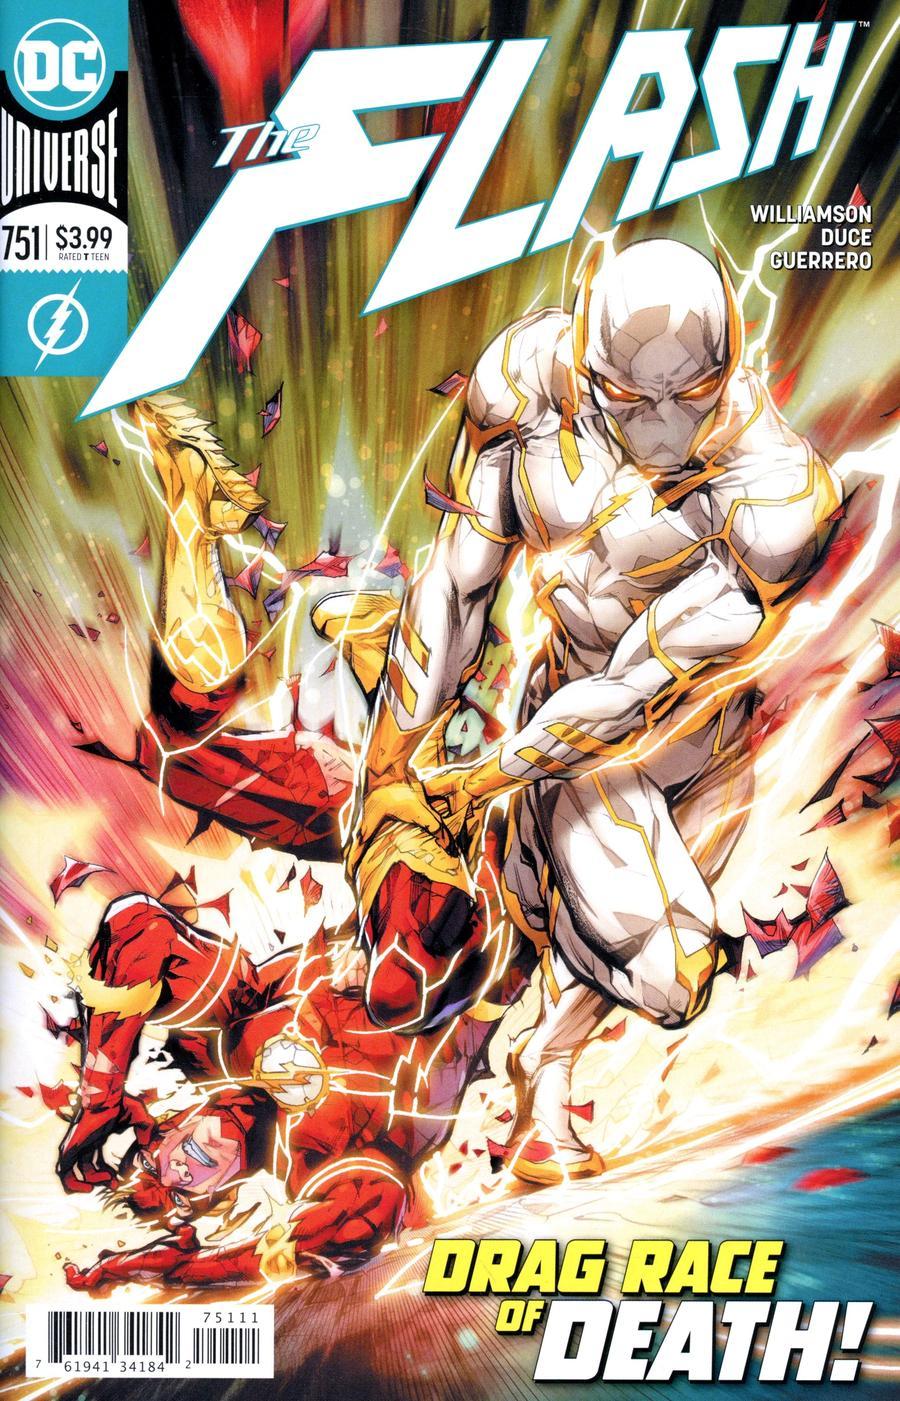 Flash Vol 5 #751 Cover A Regular Howard Porter Cover